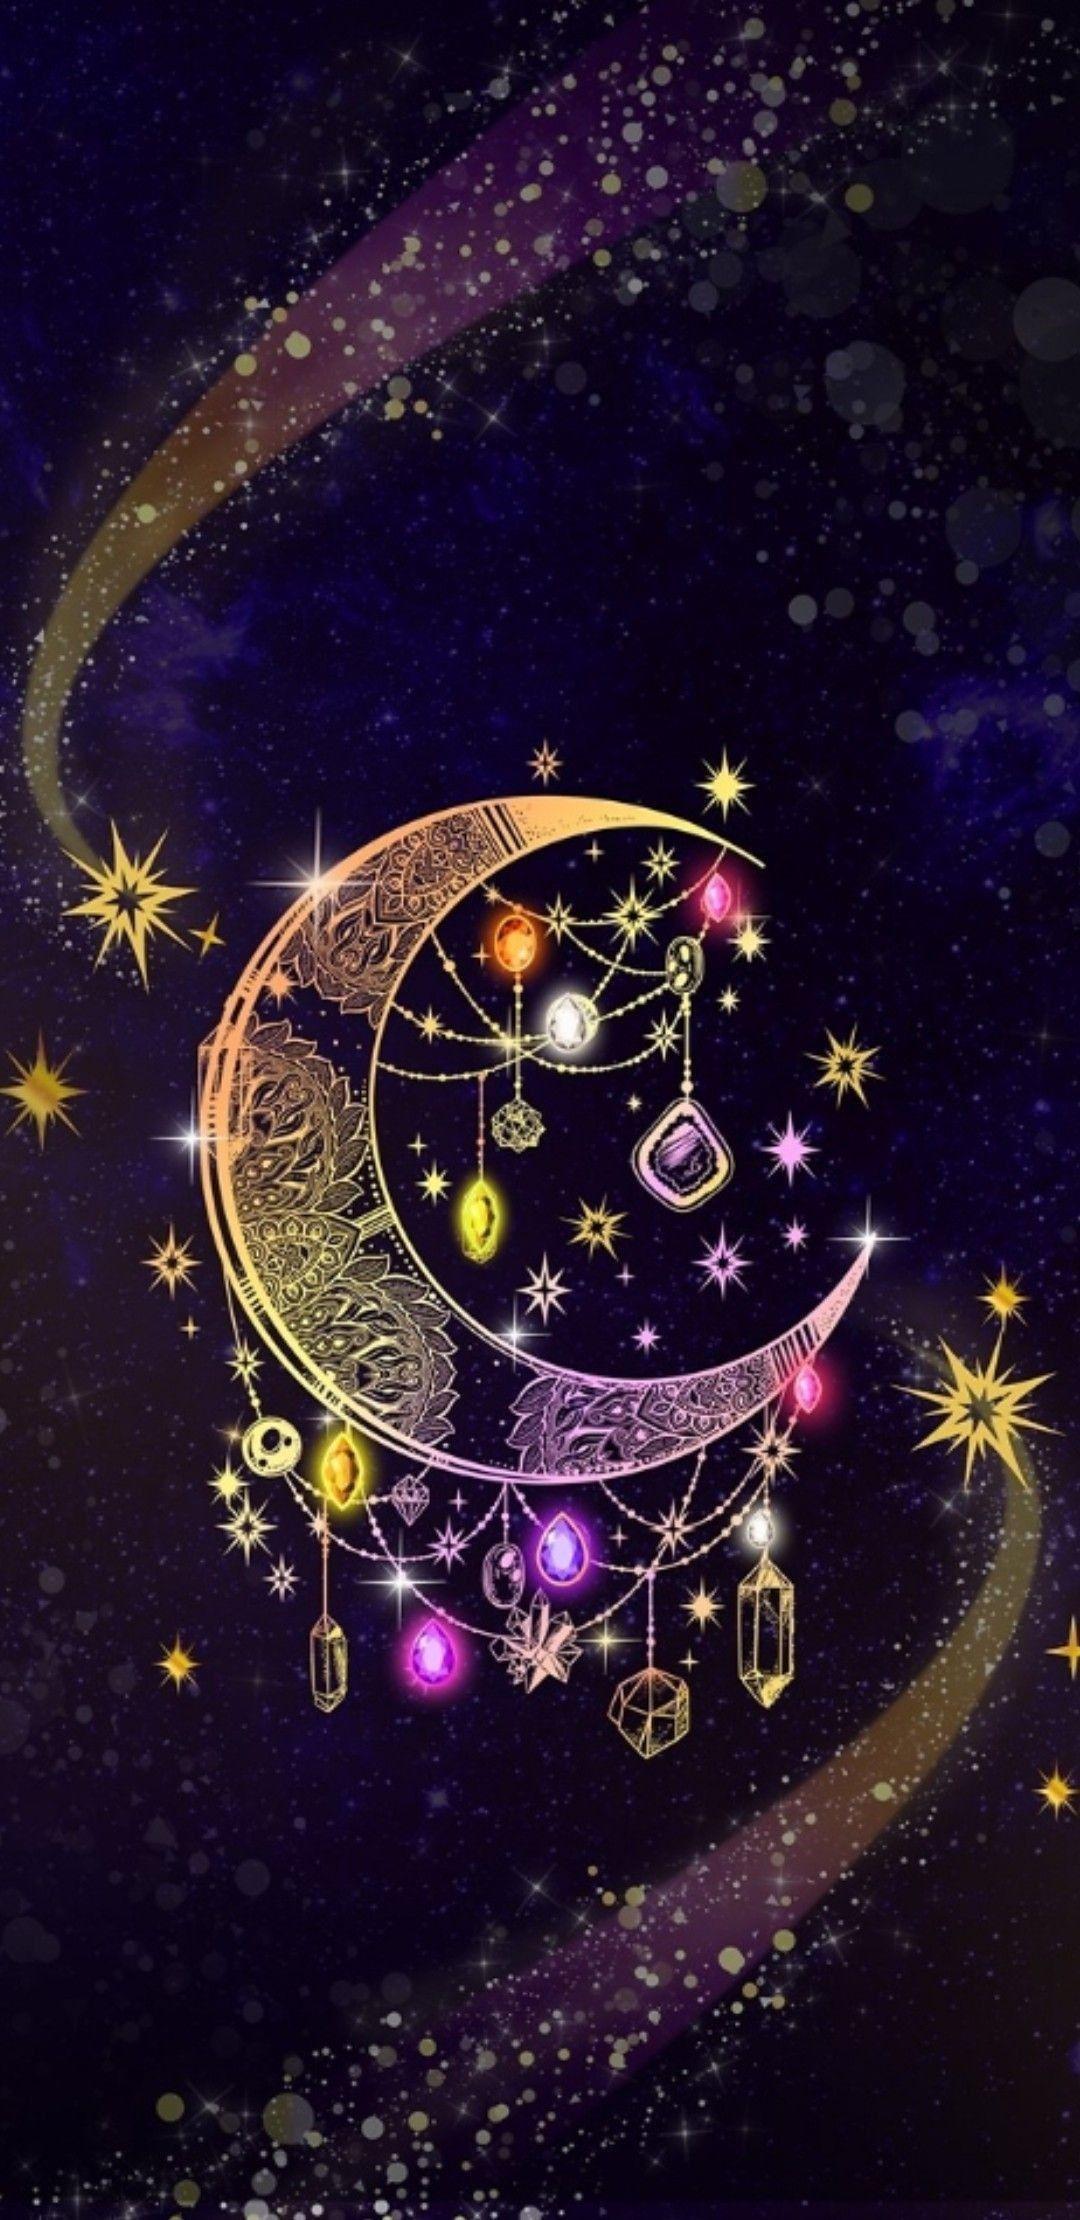 Pin By Bảo Anh On Dreamcatchers Gothic Wallpaper Dreamcatcher Wallpaper Moon Art